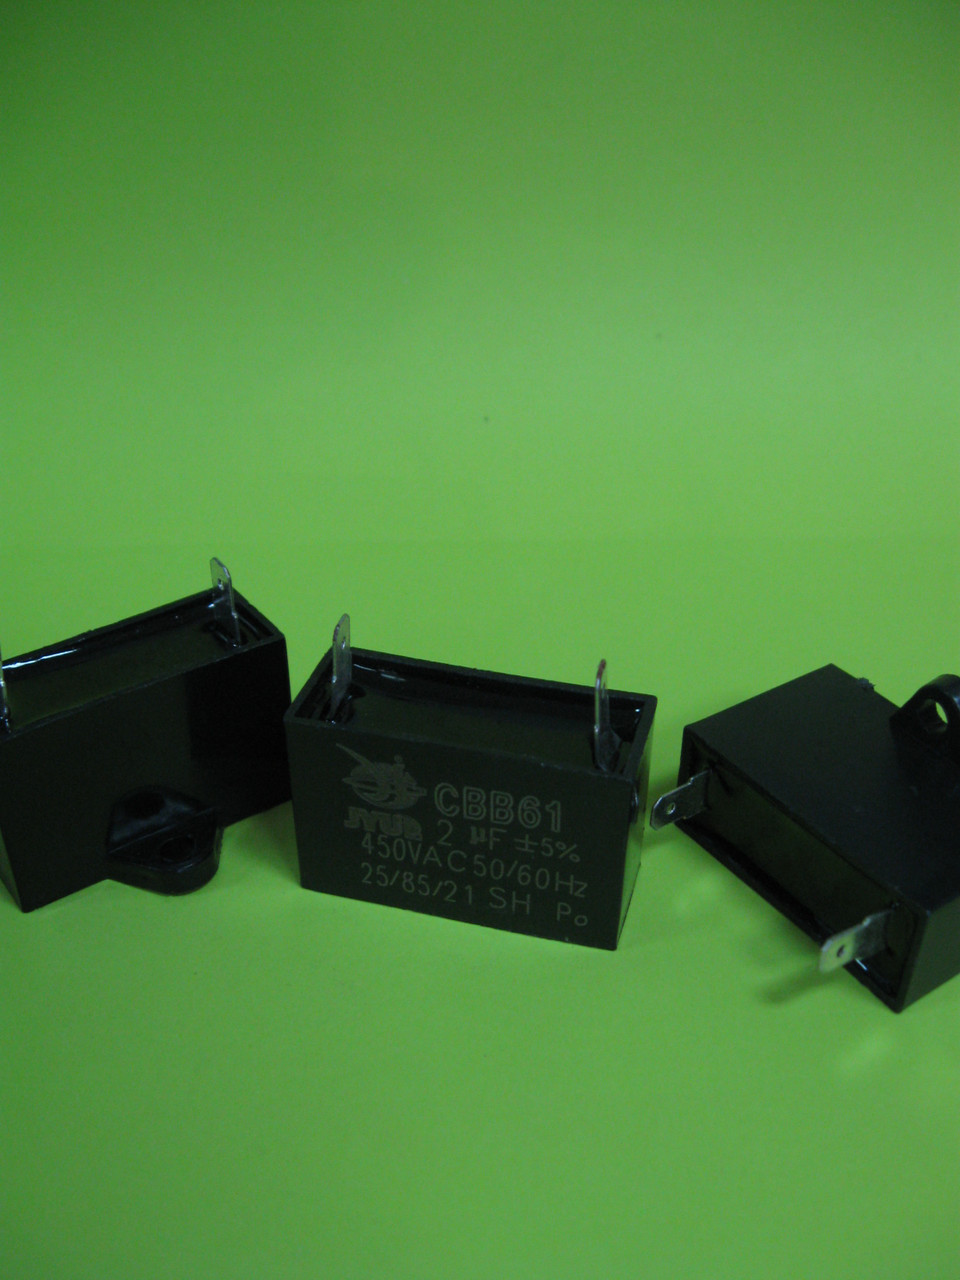 Конденсатор CBB-61 2uF 450VAC на клемах 5мм JYUL